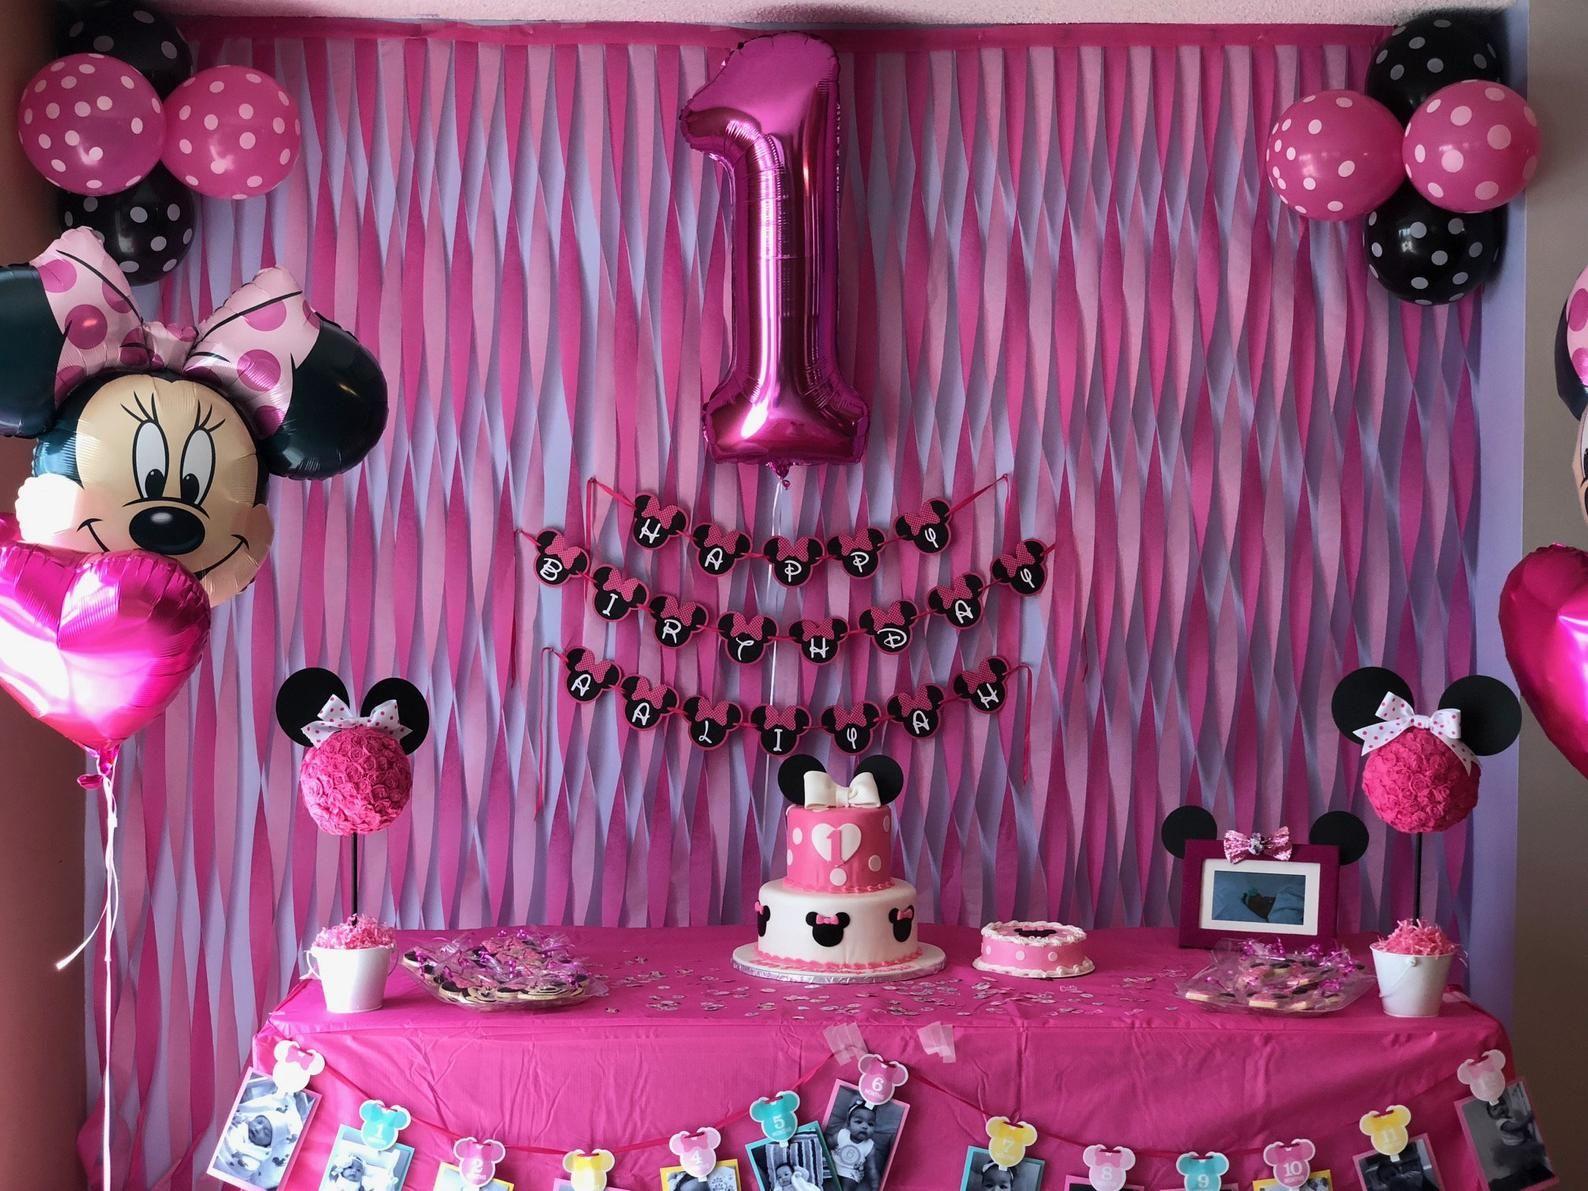 Pin On Kehlani 1st Birthday